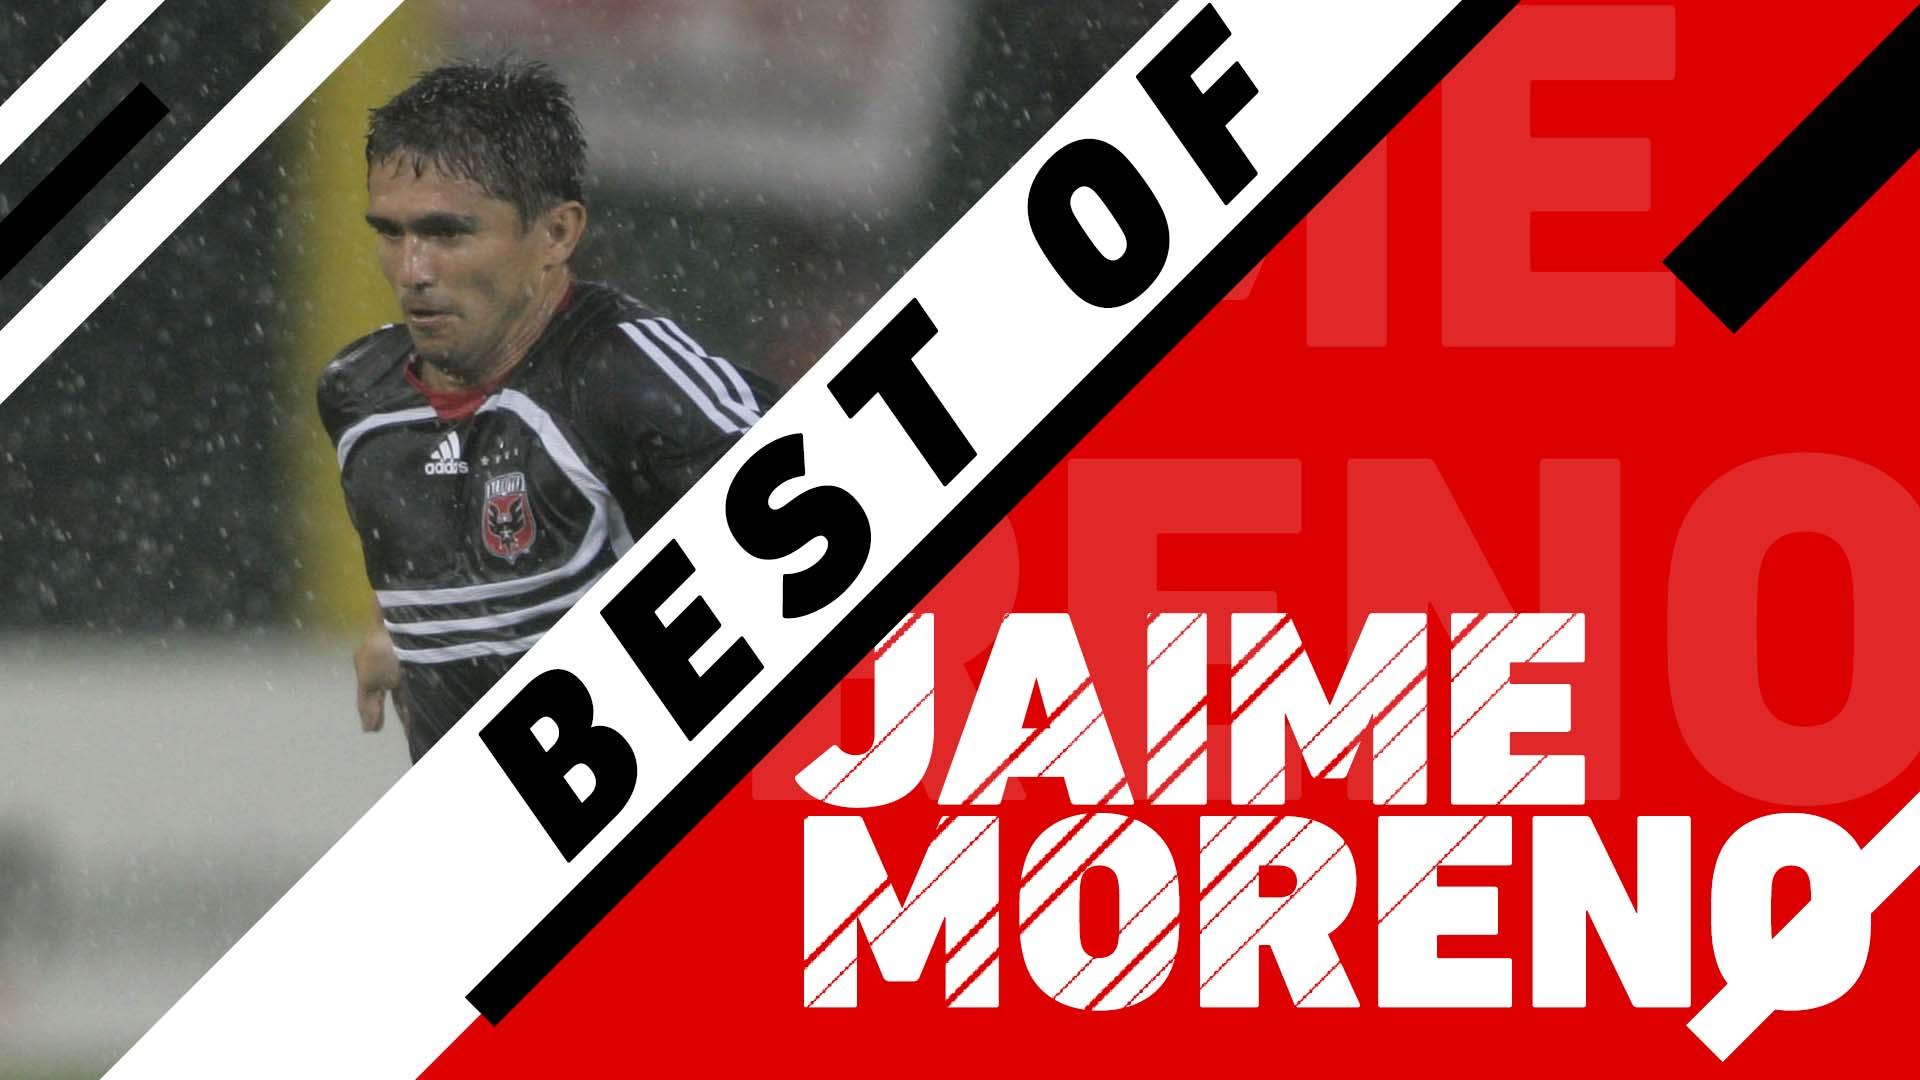 DC United legend Jaime Moreno's best goals and highlights in MLS